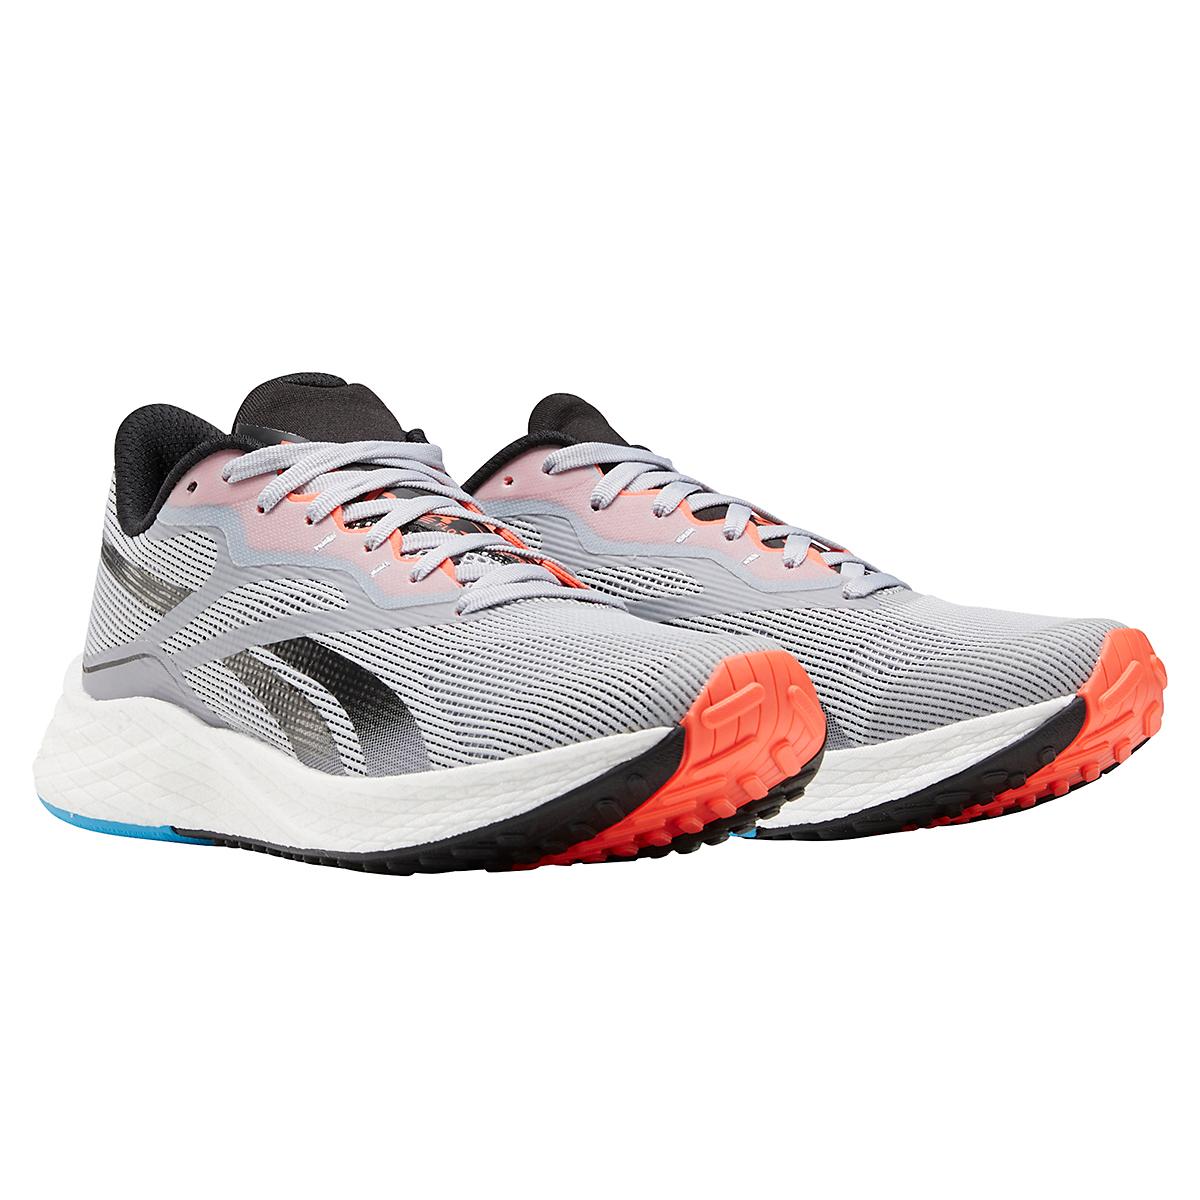 Women's Reebok Floatride Energy 3.0 Running Shoe - Color: Cold Grey/Core Black/Orange Flare - Size: 5 - Width: Regular, Cold Grey/Core Black/Orange Flare, large, image 4